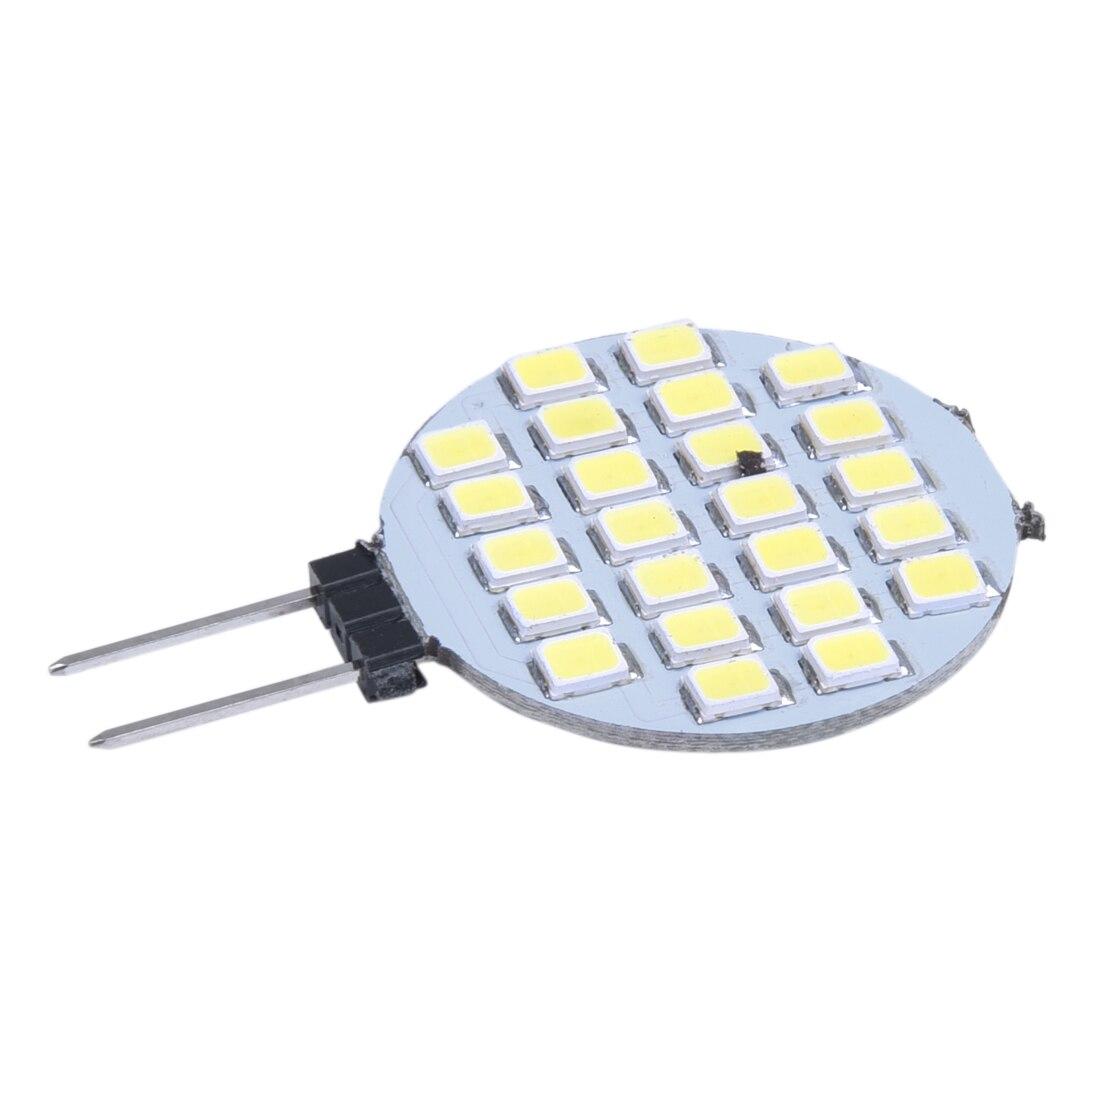 Nuevo G4 1210 SMD 24 bombilla LED, bombilla blanca, 6000-6500K DC 12V